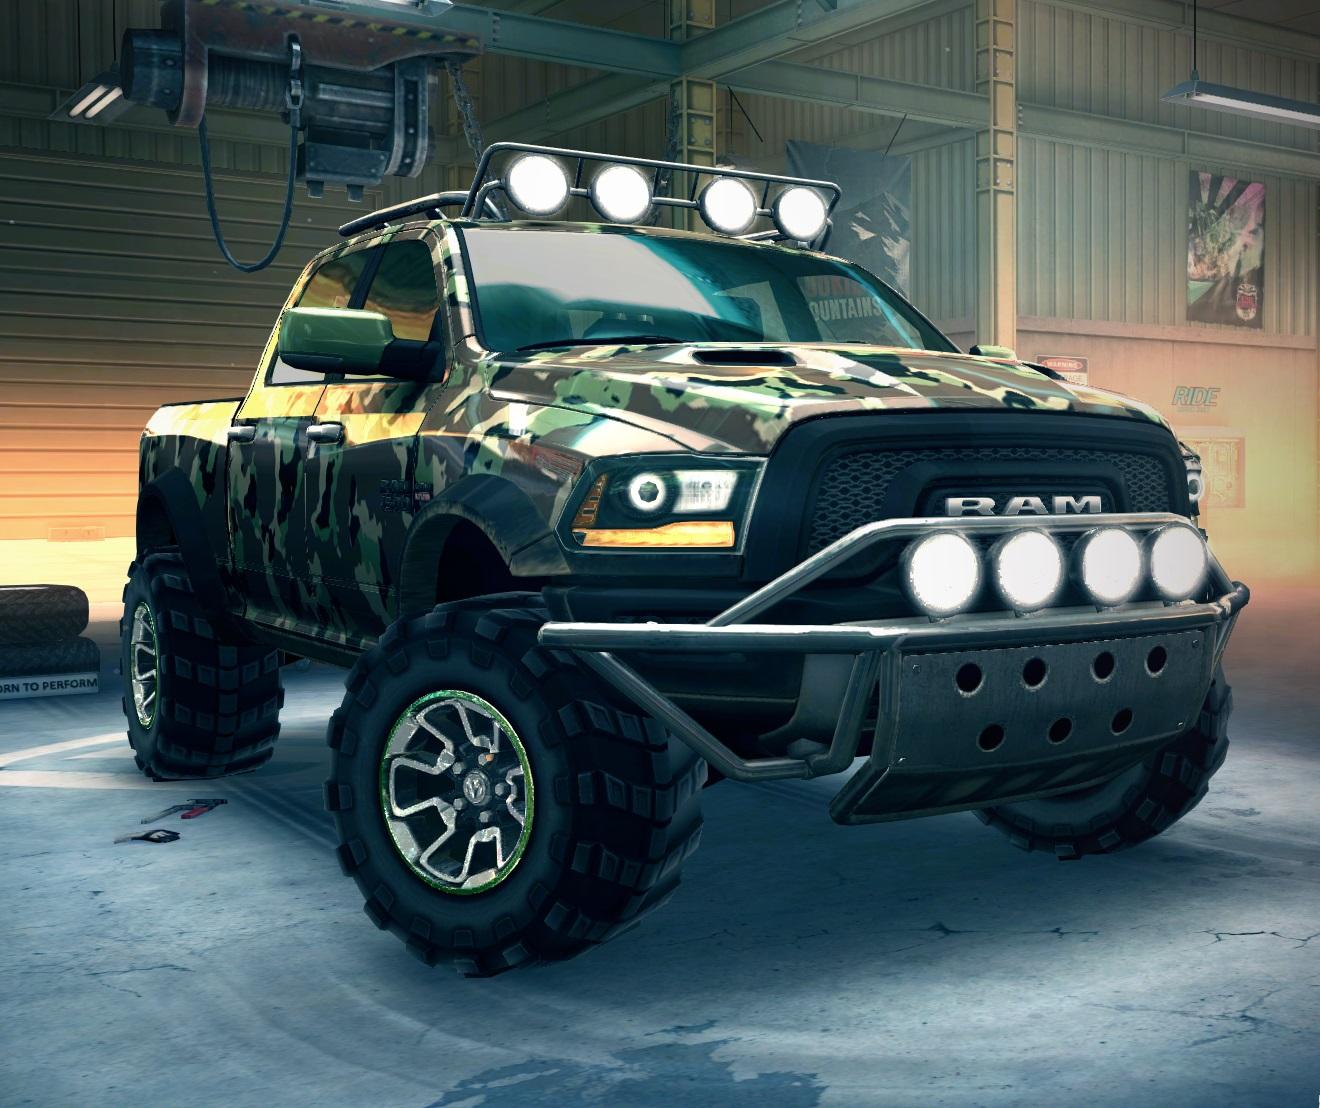 Dodge Ram Trx >> Asphalt Xtreme Dodge Ram 1500 Rebel Trx Special Edition